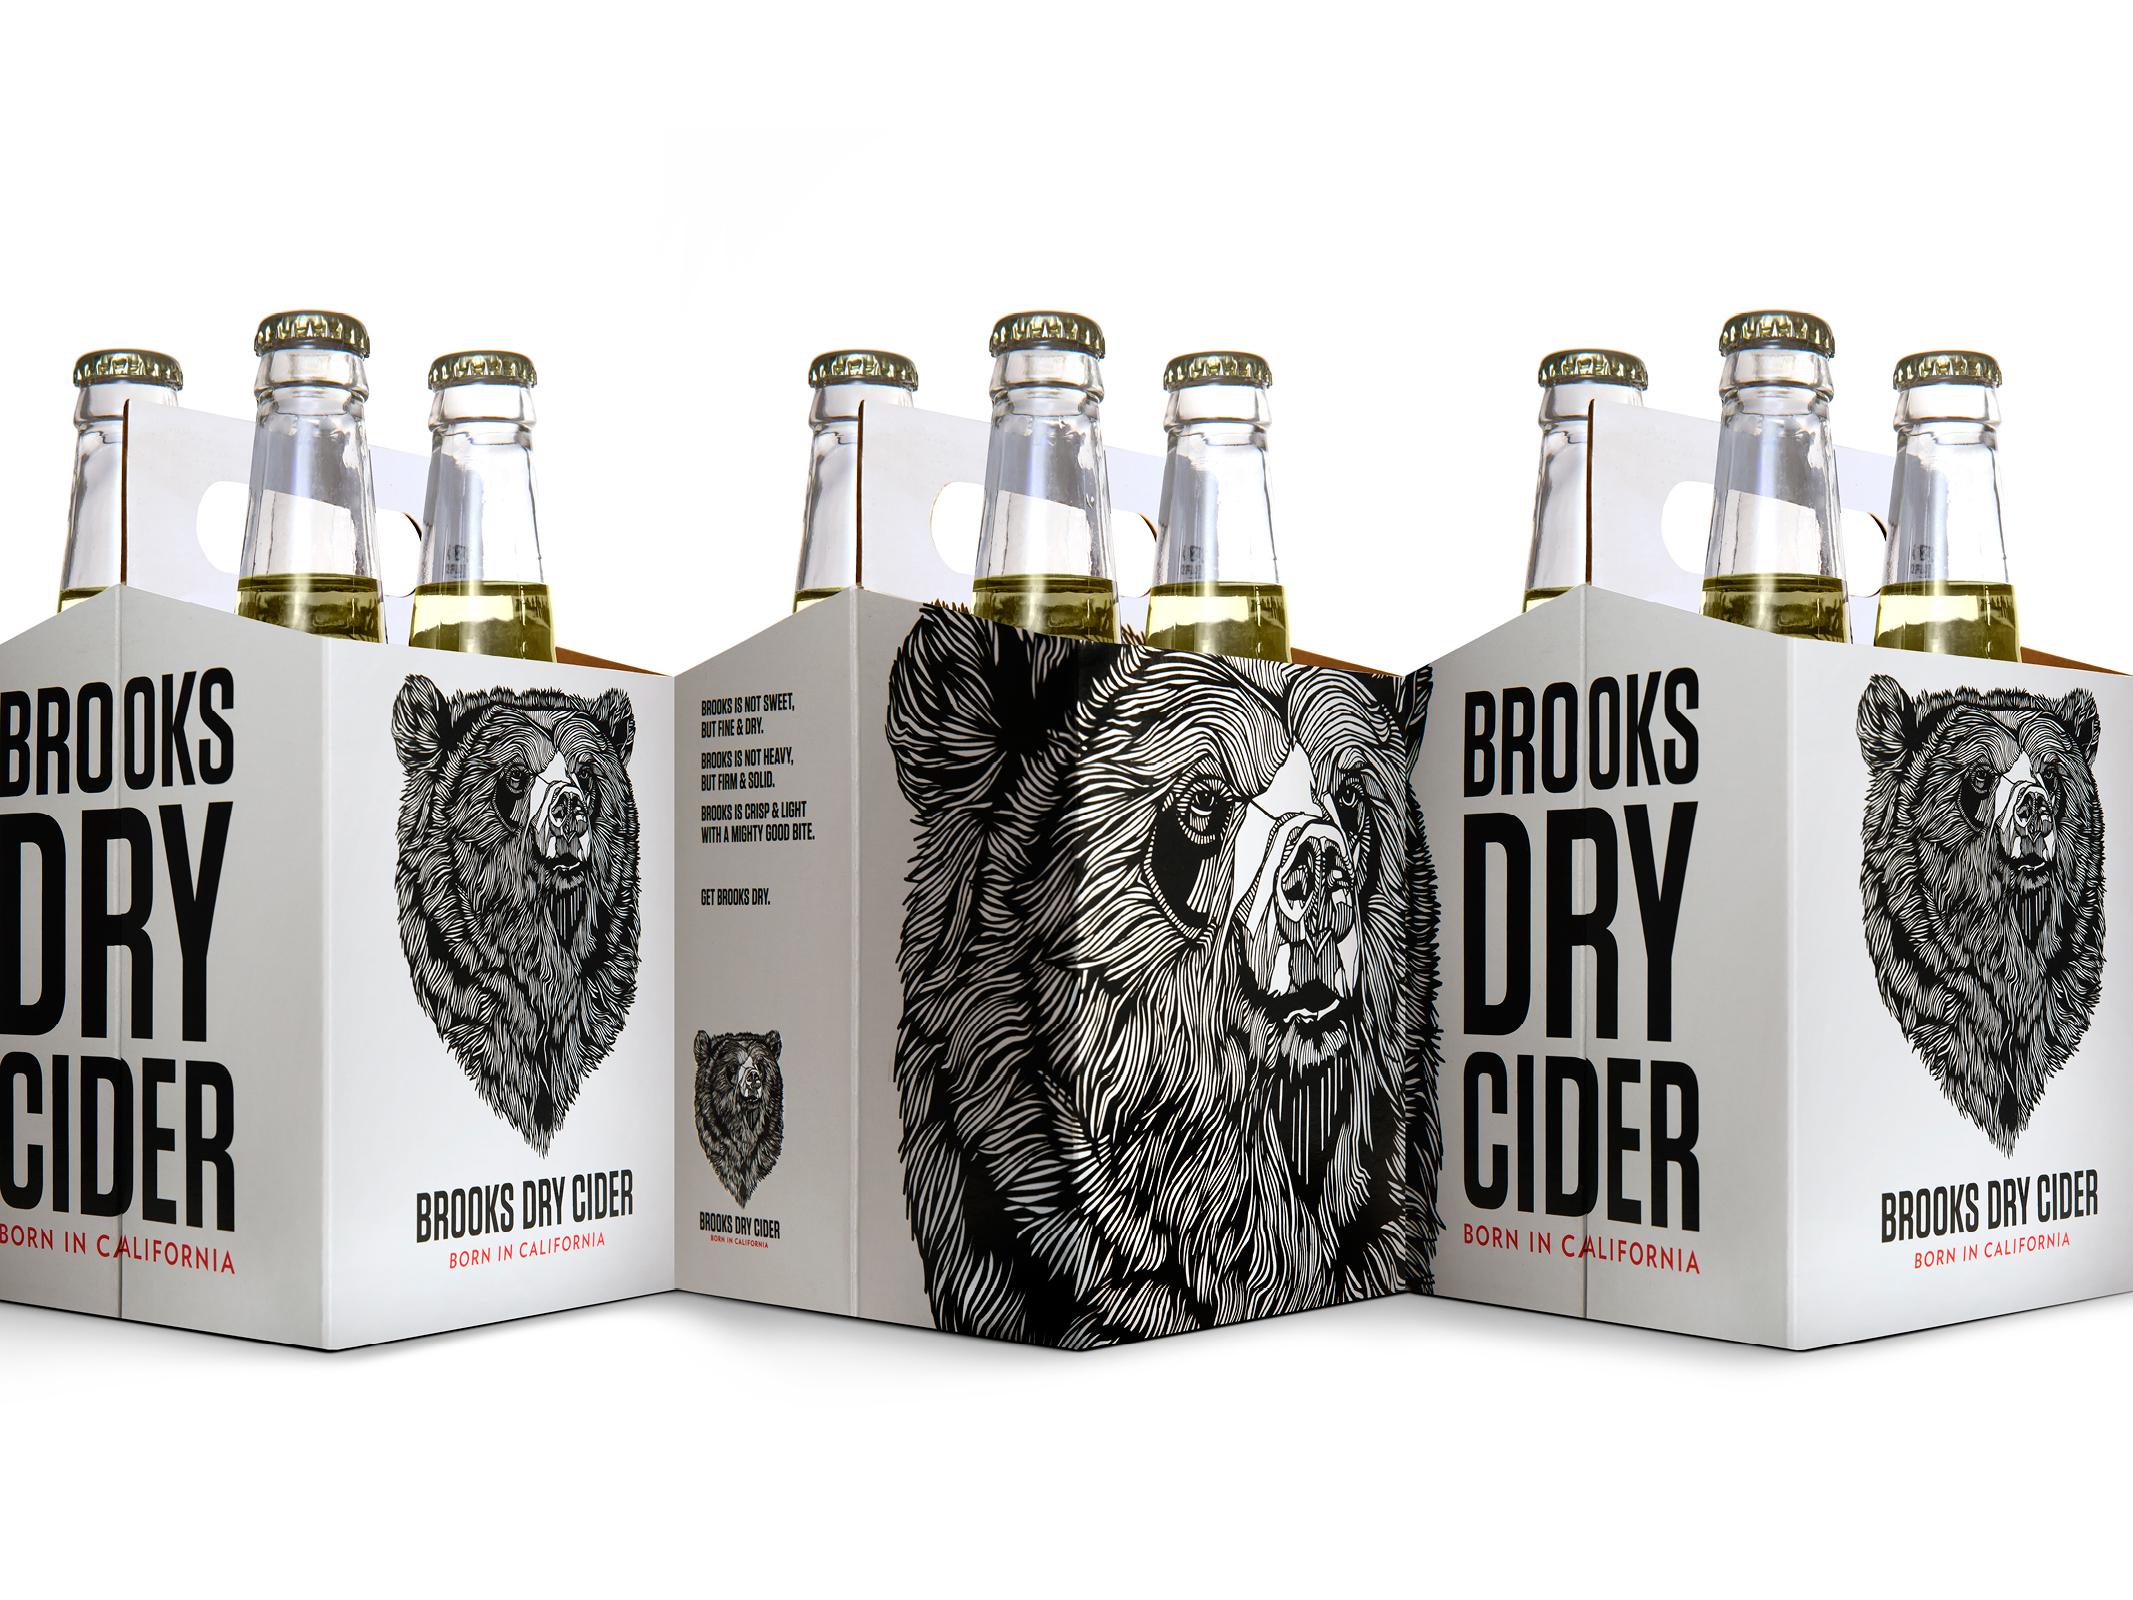 Brooks Dry Cider Graphis